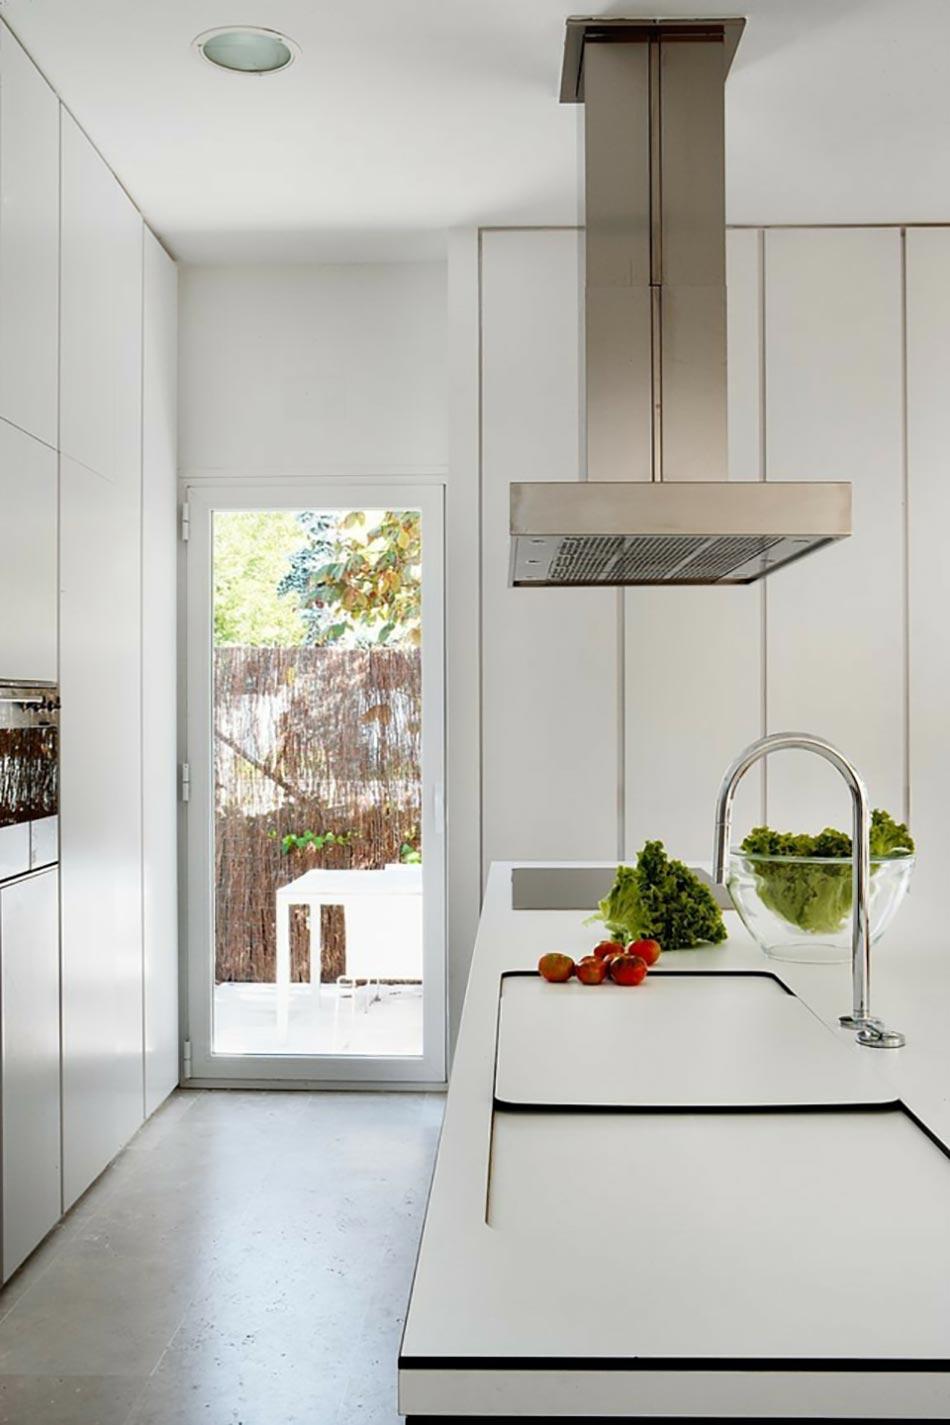 La Cuisine Moderne Et Ses Visages Multiples Design Feria